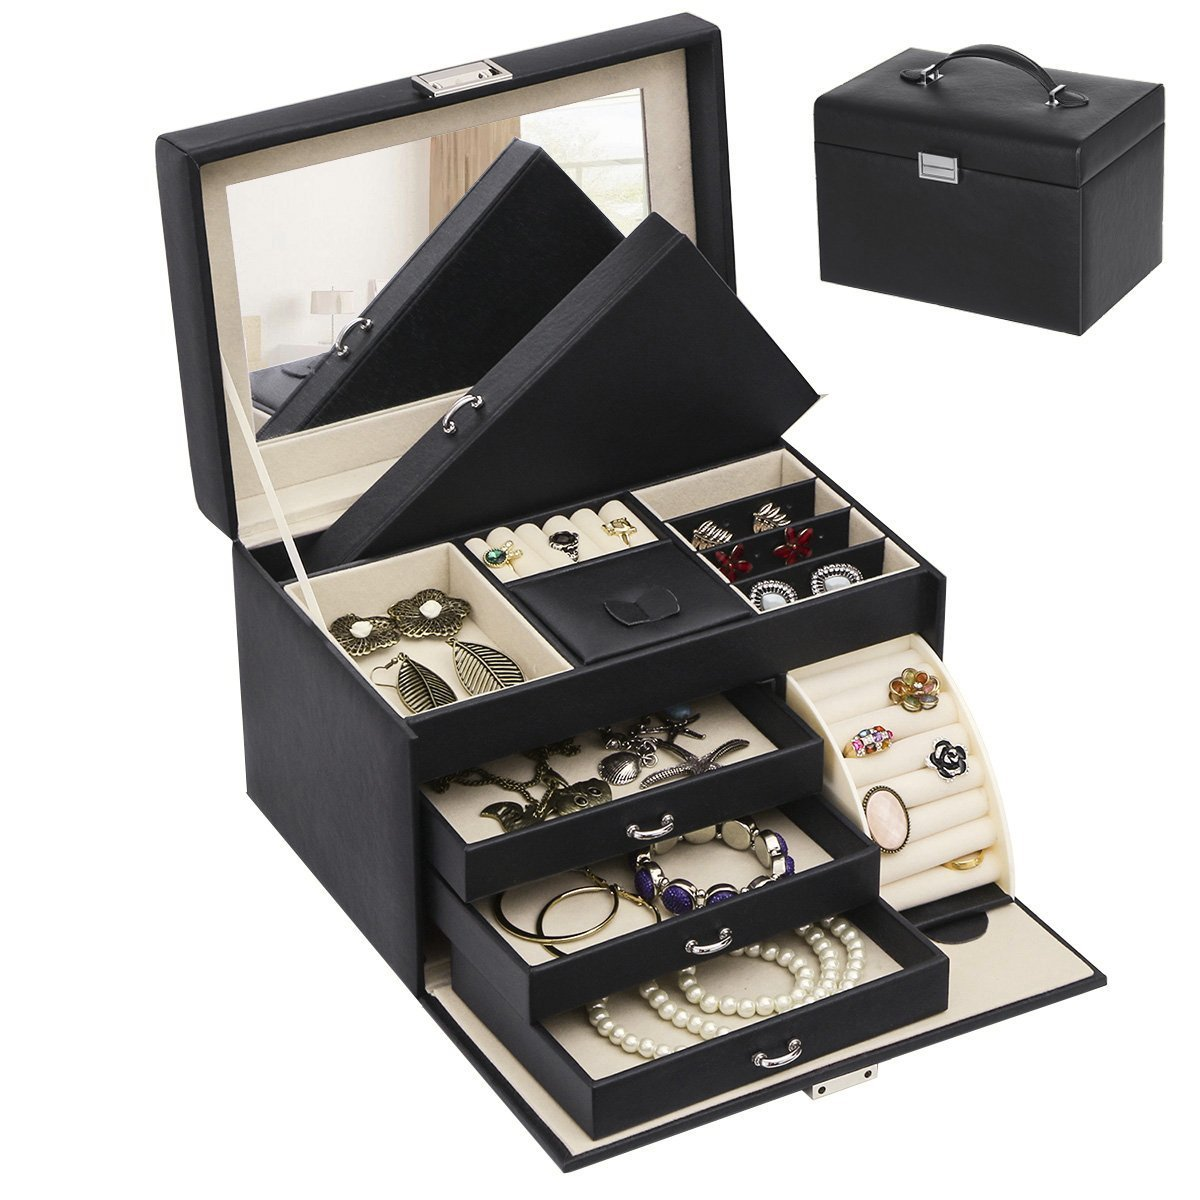 BEWISHOME Jewelry Box Organizer Case Display Storage W/Travel Case Large Mirrored 10 1/4'' x 7 1/16'' x 6 11/16'' Black PU Leather for Girls Women SSH53B